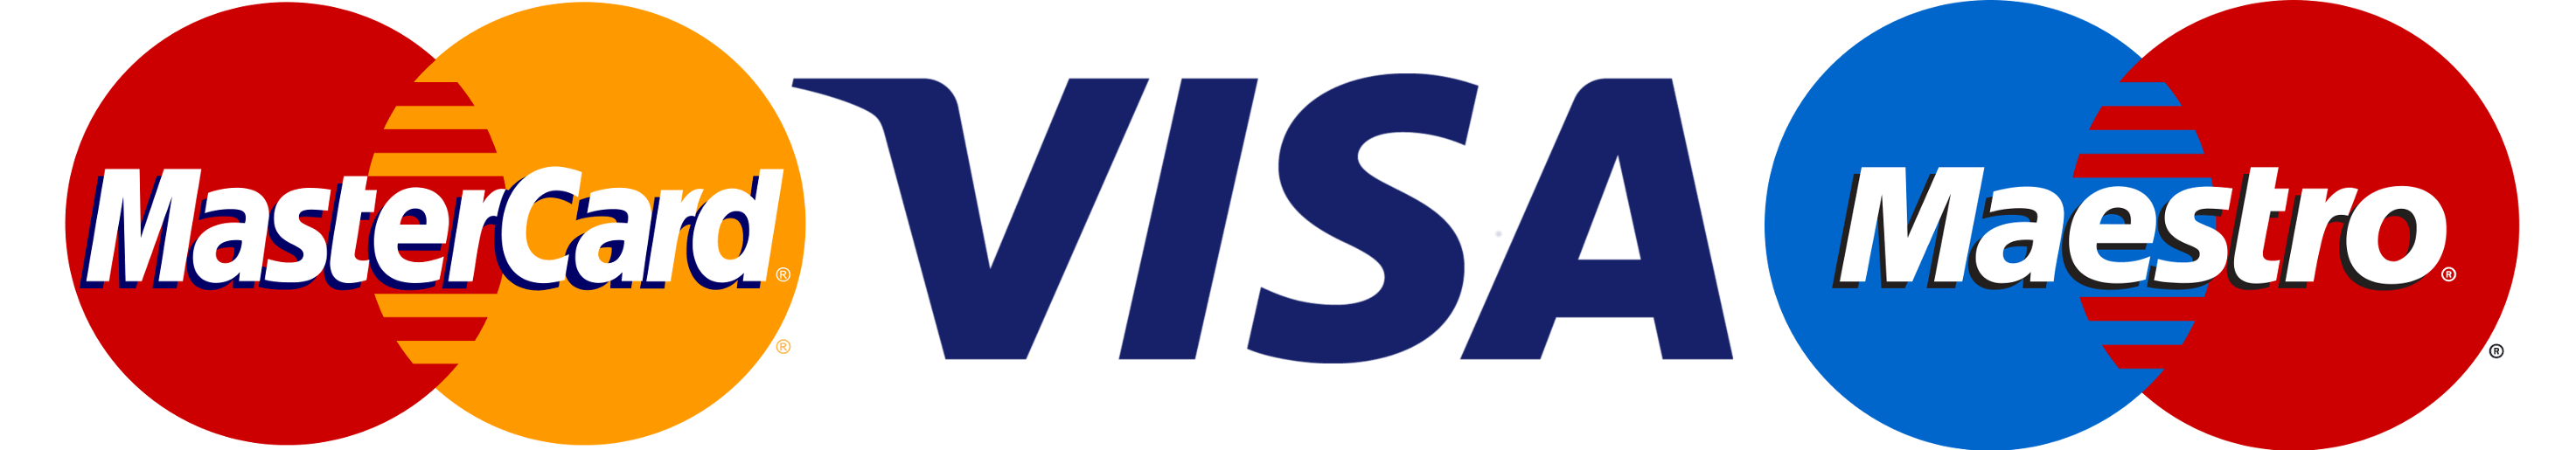 MasterCard VISA Maestro